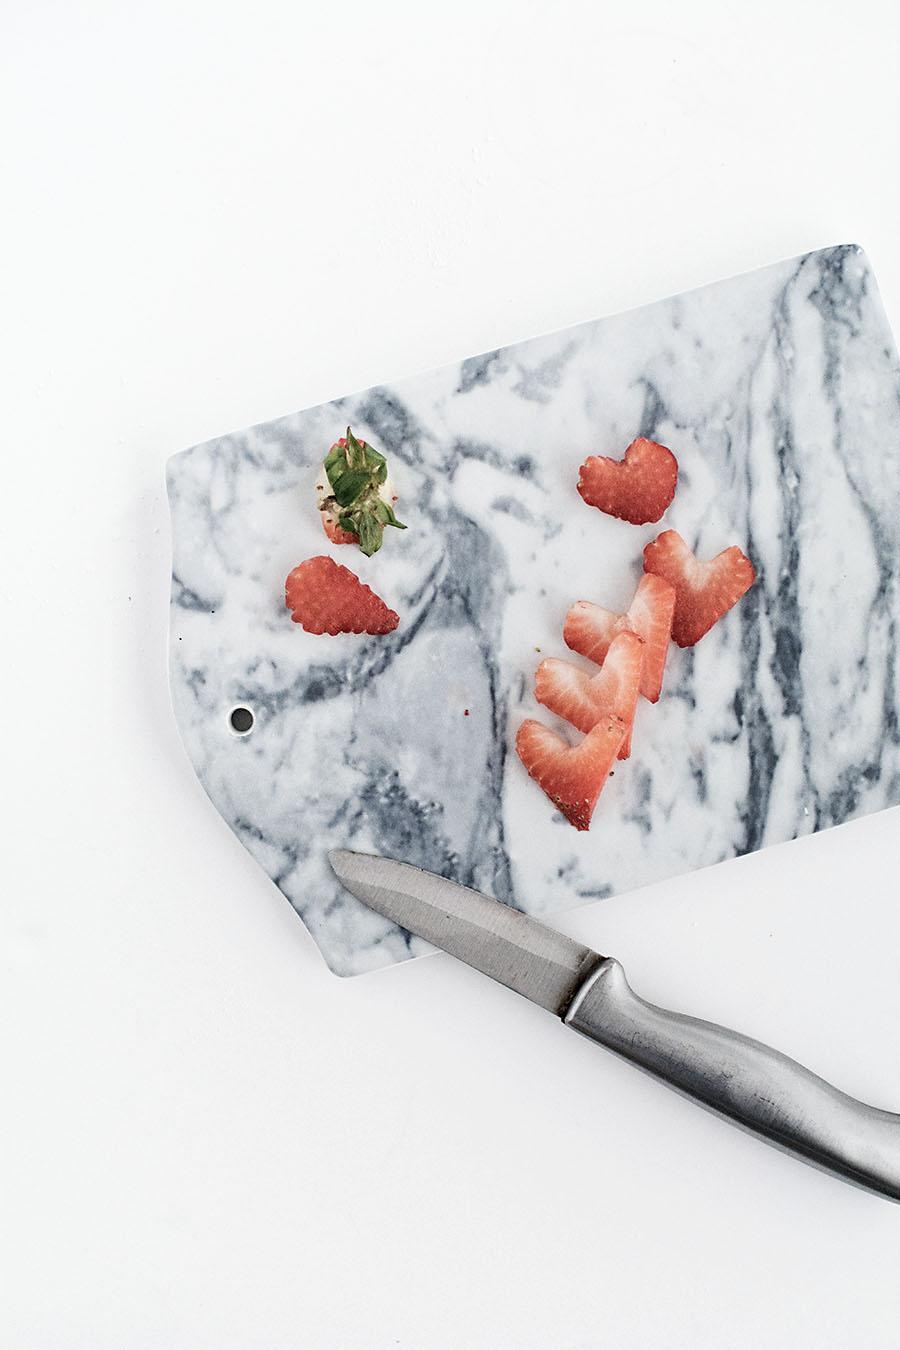 heart-shaped-strawberries